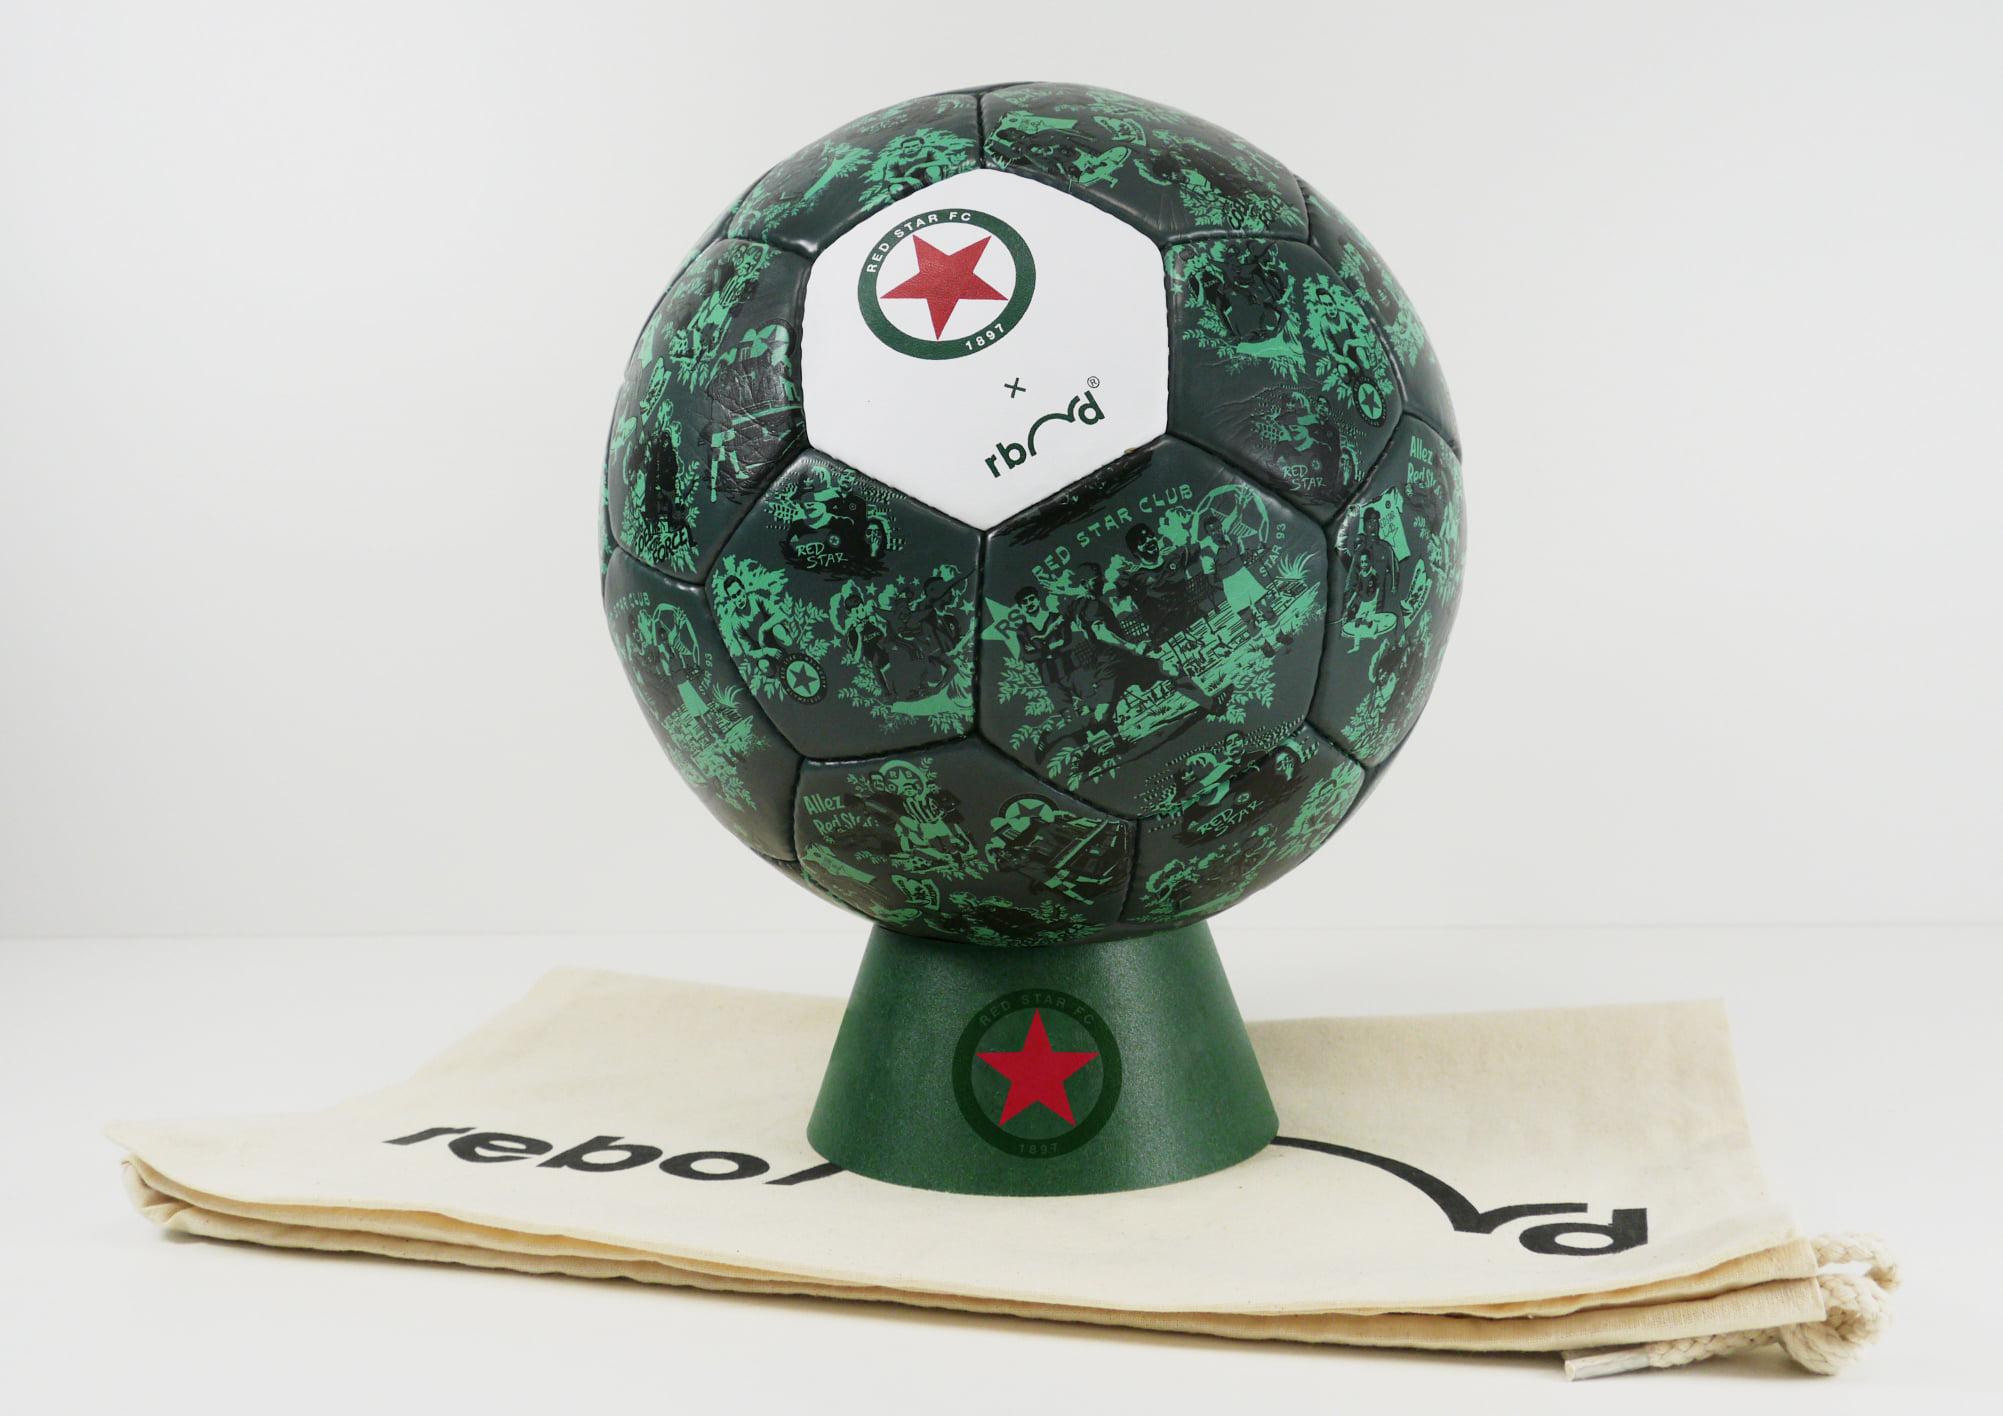 Rebond Ballon Red Star Ecolosport